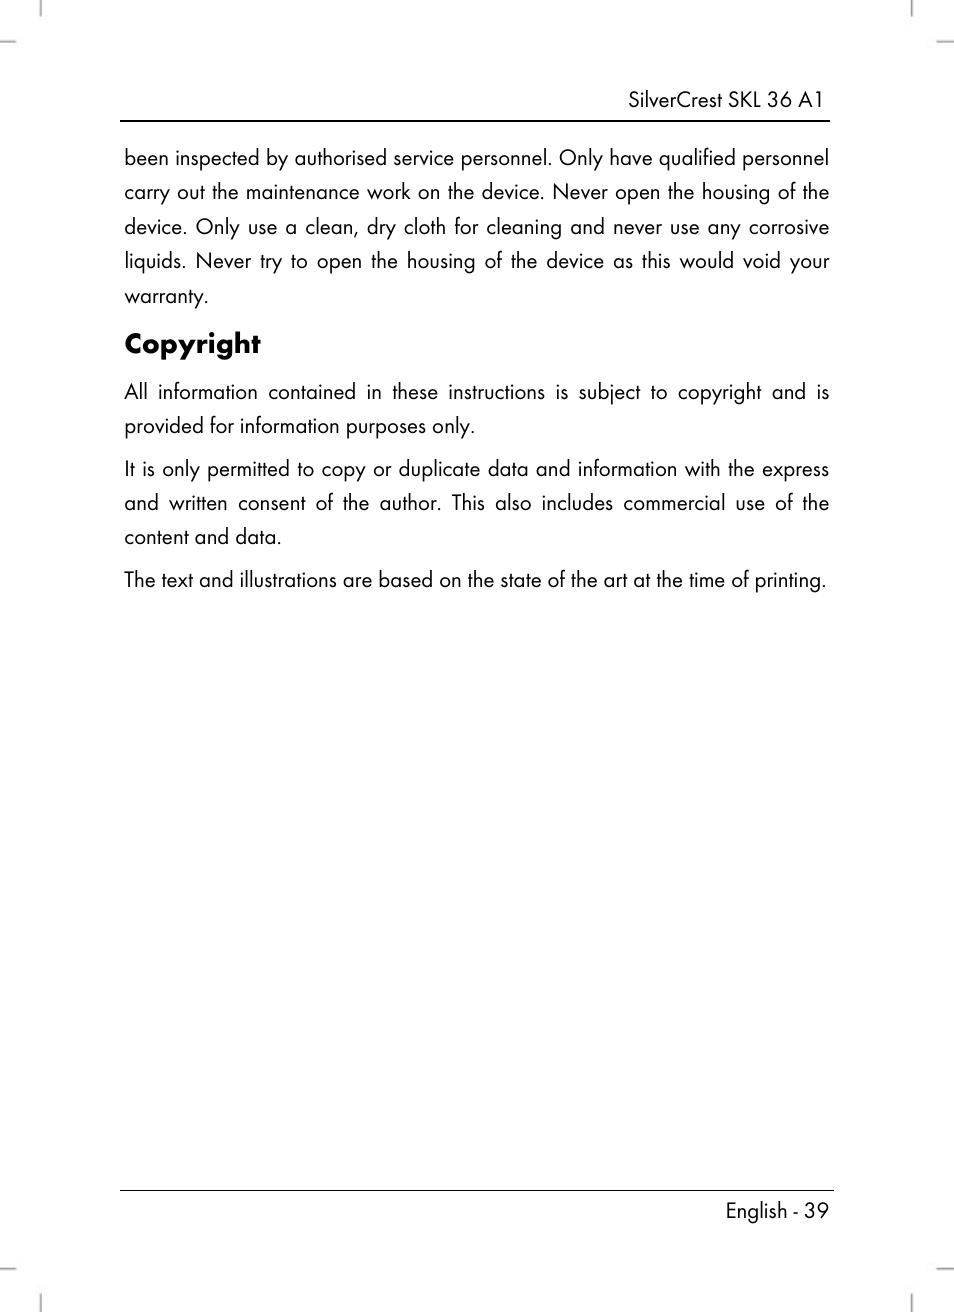 Copyright | Silvercrest SKL 36 A1 User Manual | Page 41 / 64